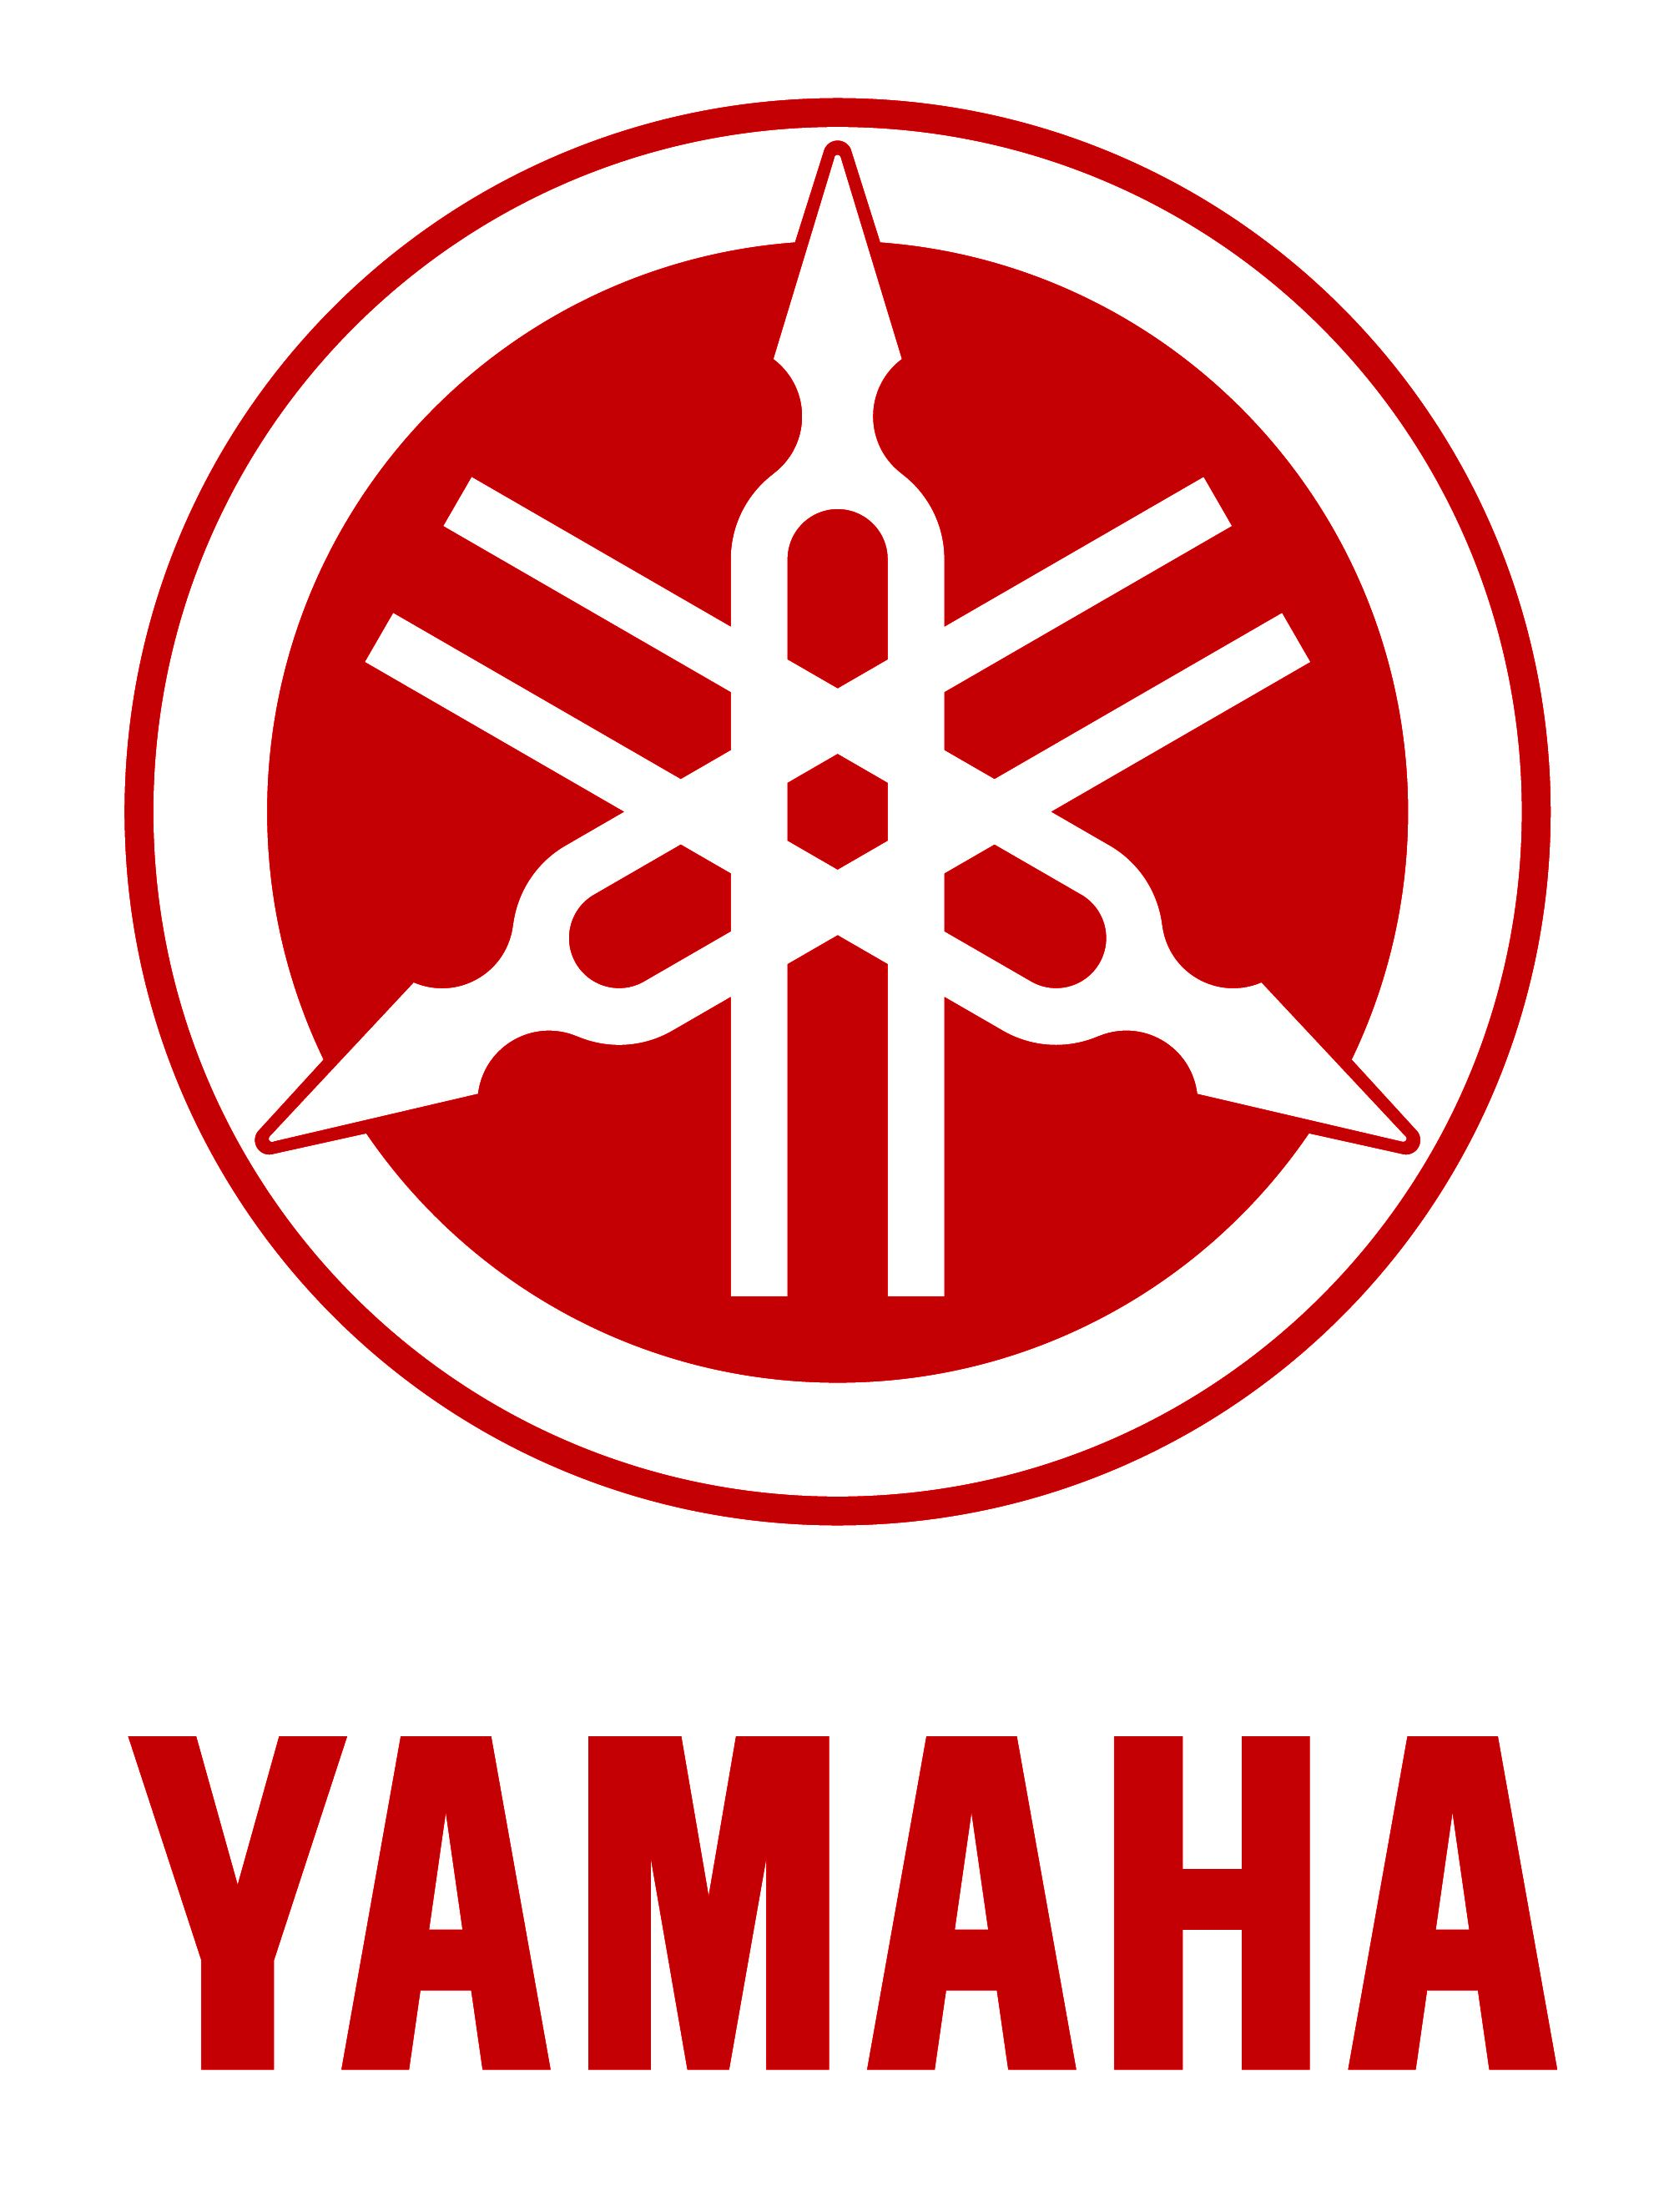 Yamaha Motor Logo transparent image